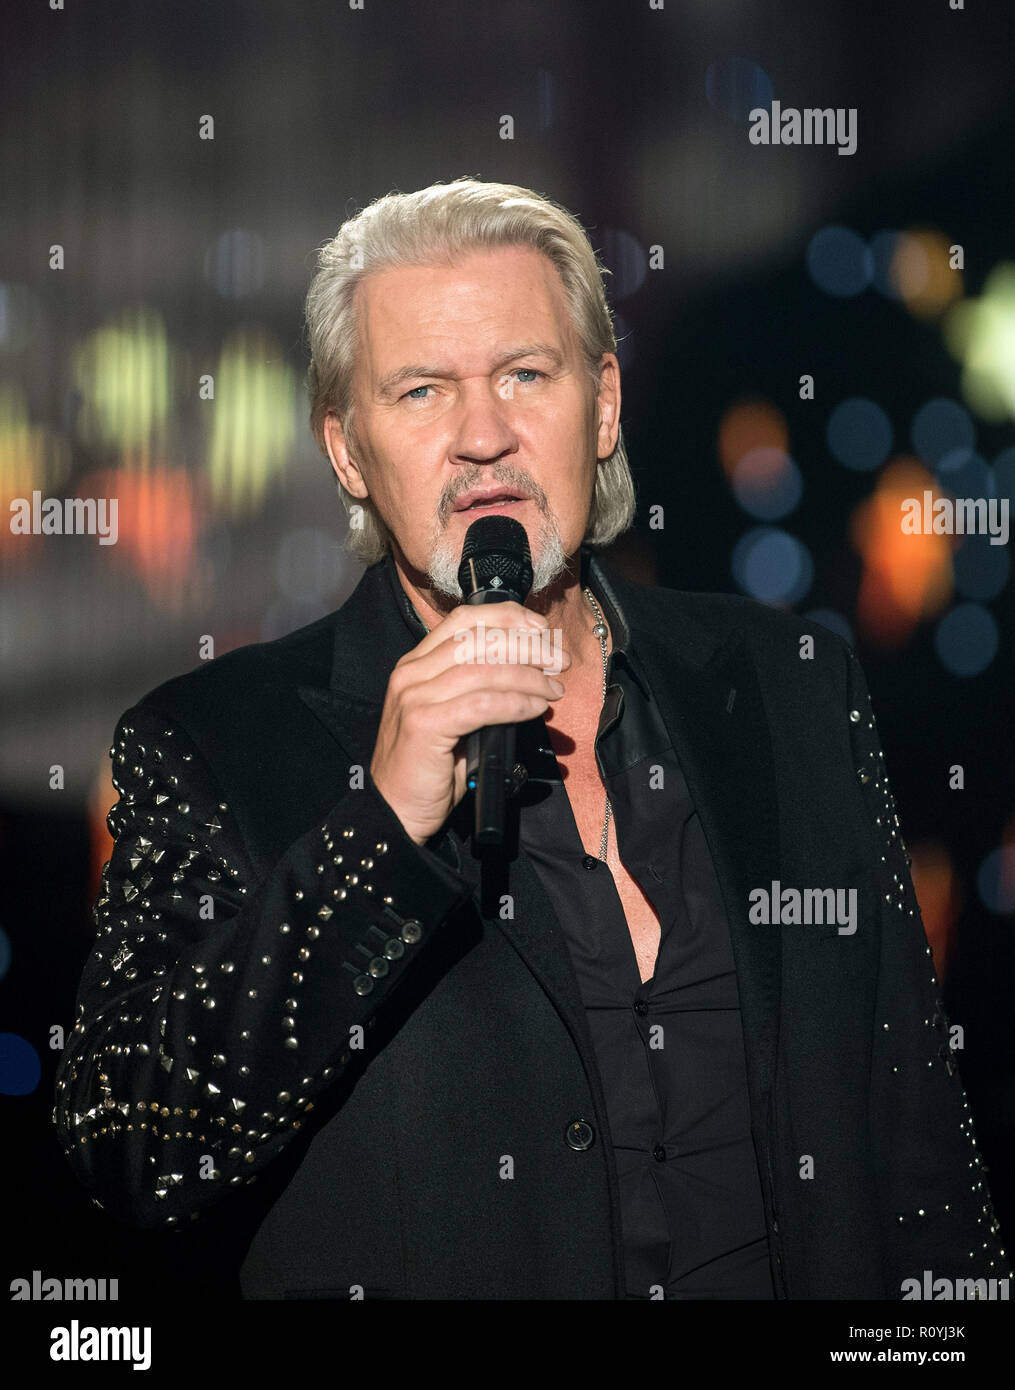 06. November 2018, Sachsen, Zwickau: Sänger Johnny Logan singt bei ...